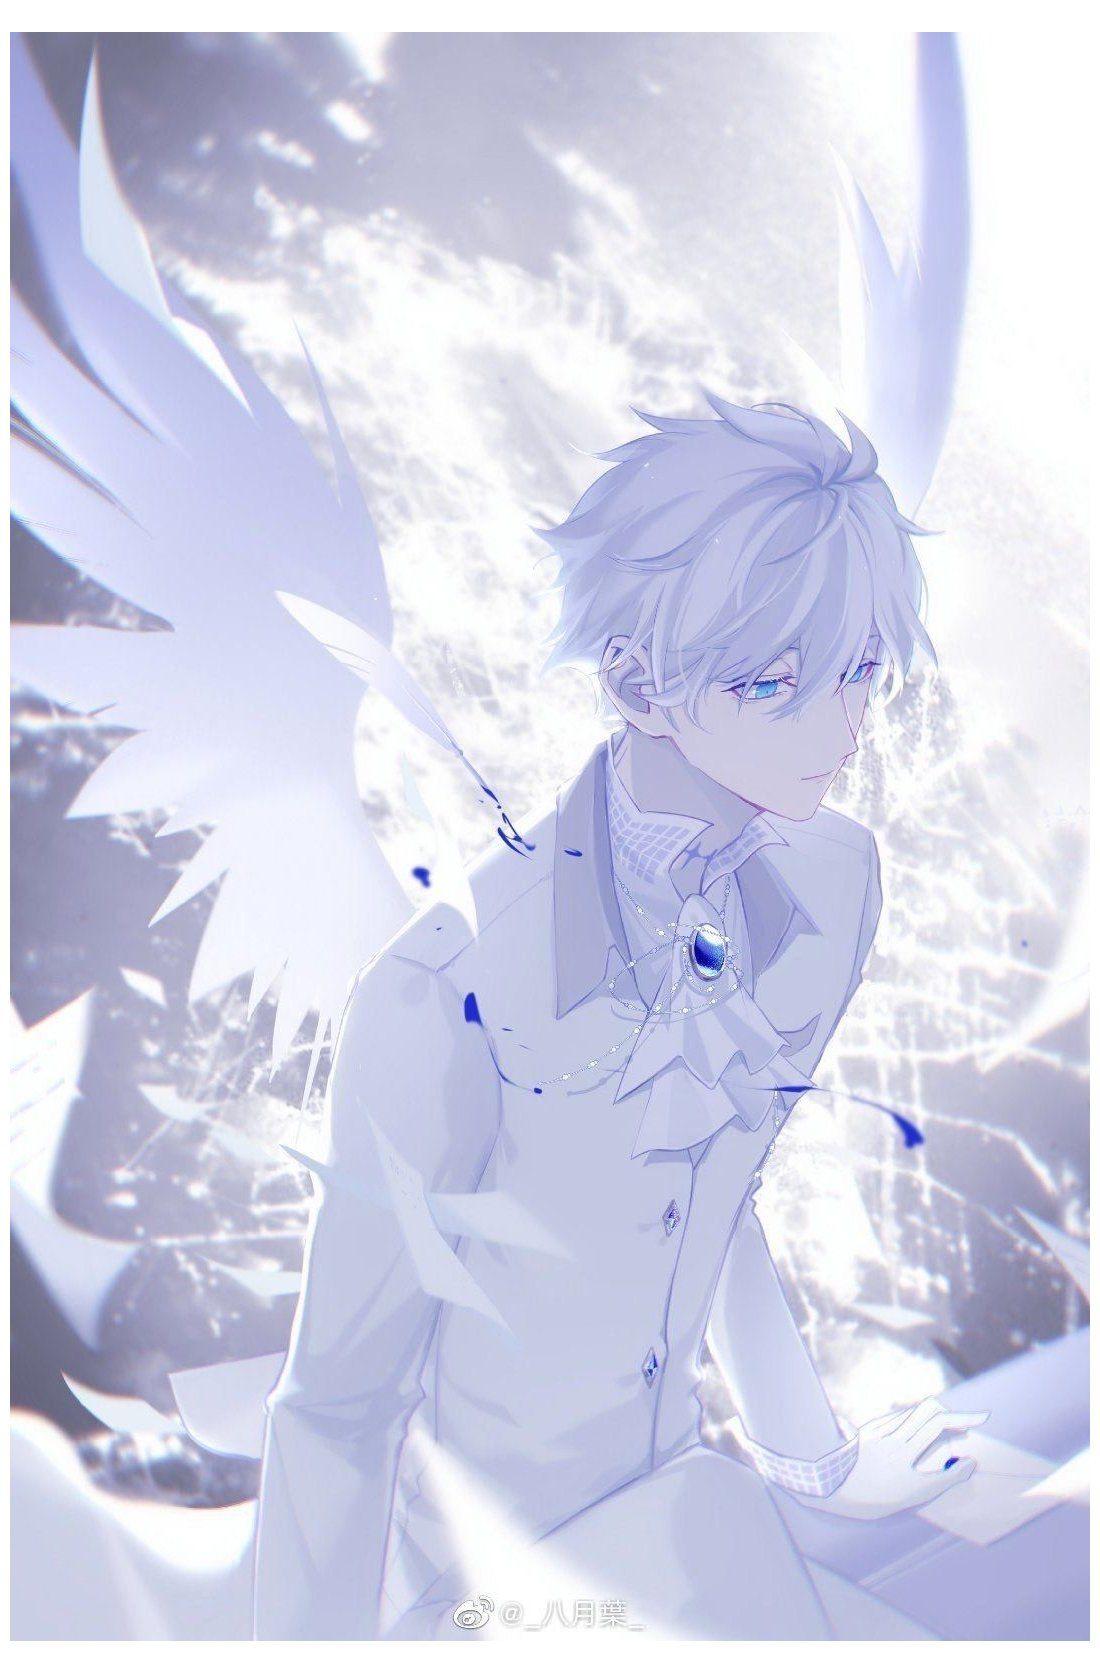 Angel Anime Boy Anime Drawings Boy Anime Anime Fantasy